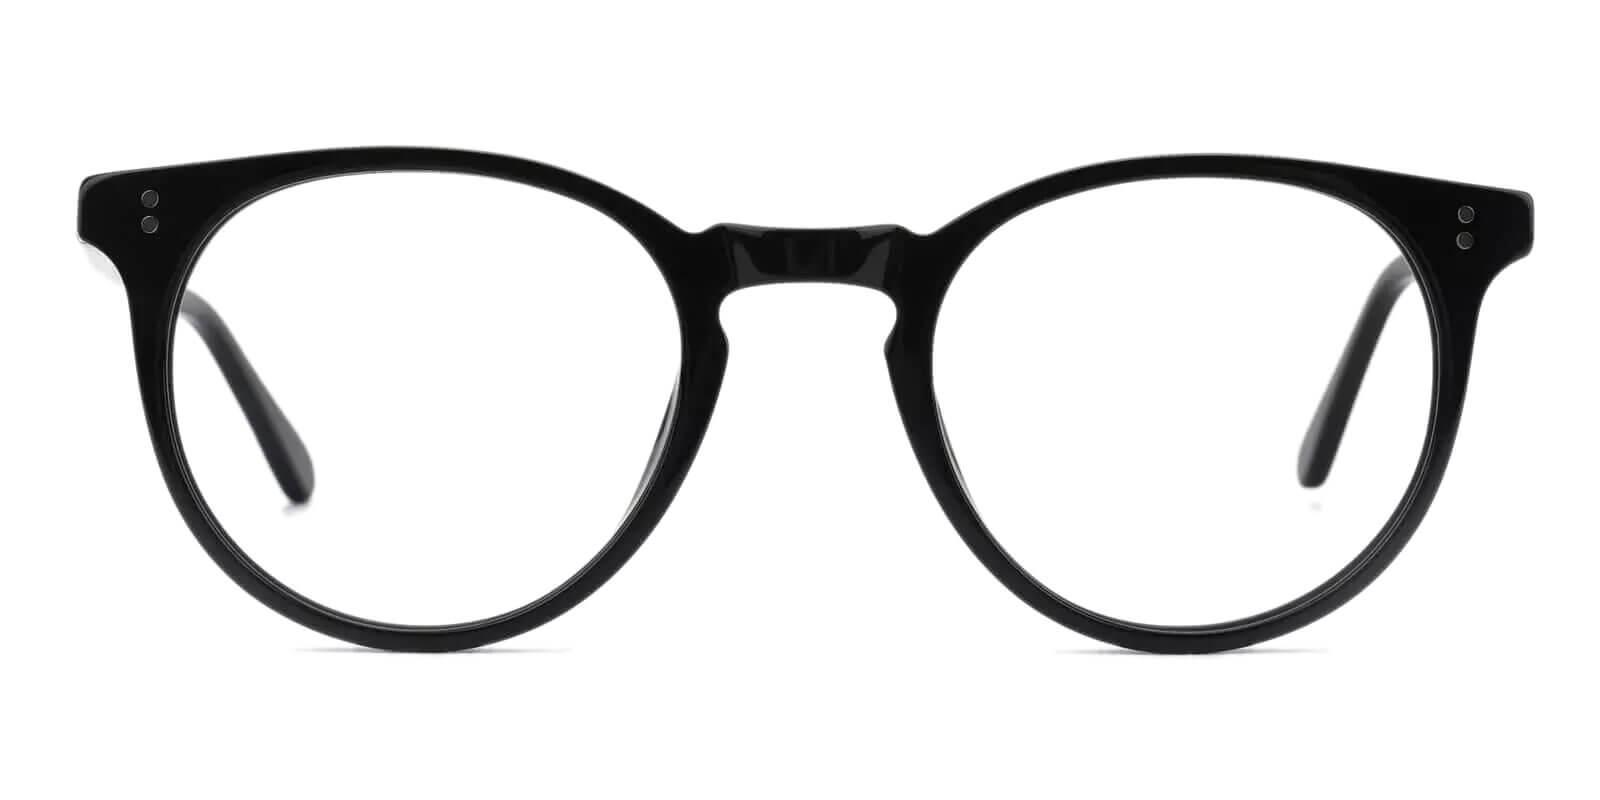 Mercury Black Acetate Eyeglasses , UniversalBridgeFit Frames from ABBE Glasses